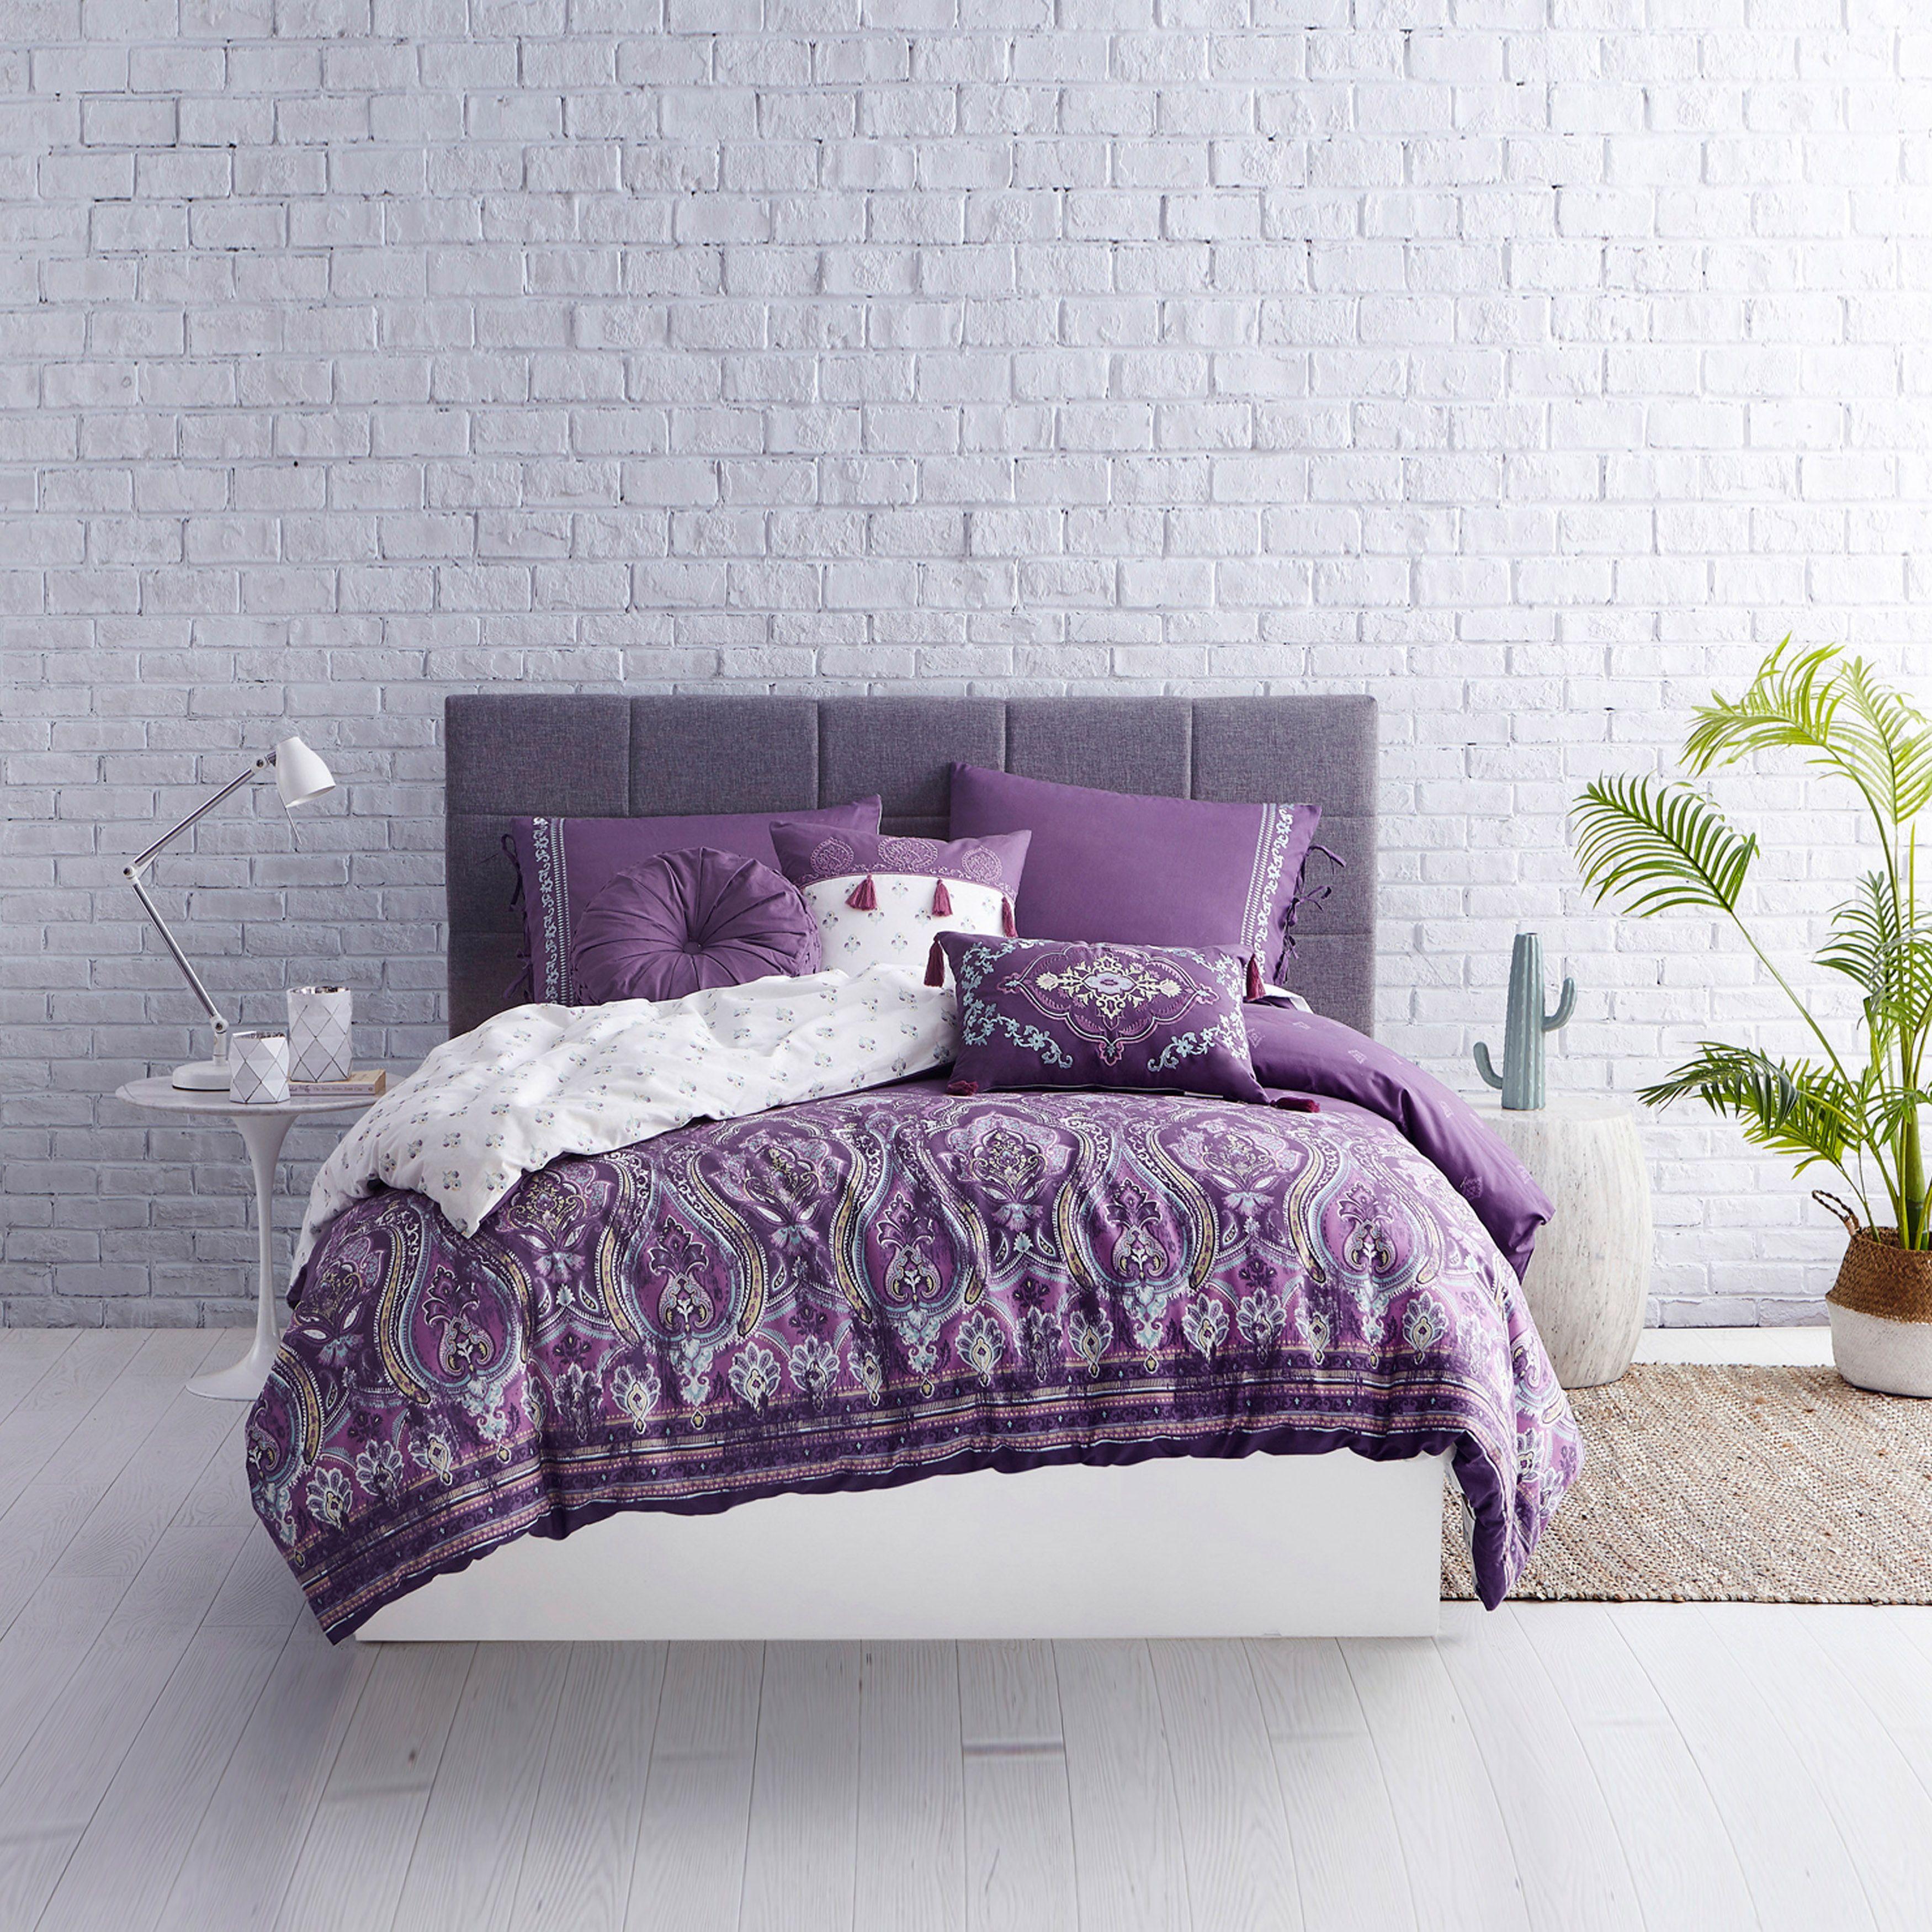 Boheme Cotton Comforter Set In Purple Cotton Comforter Set Comforter Sets Duvet Sets